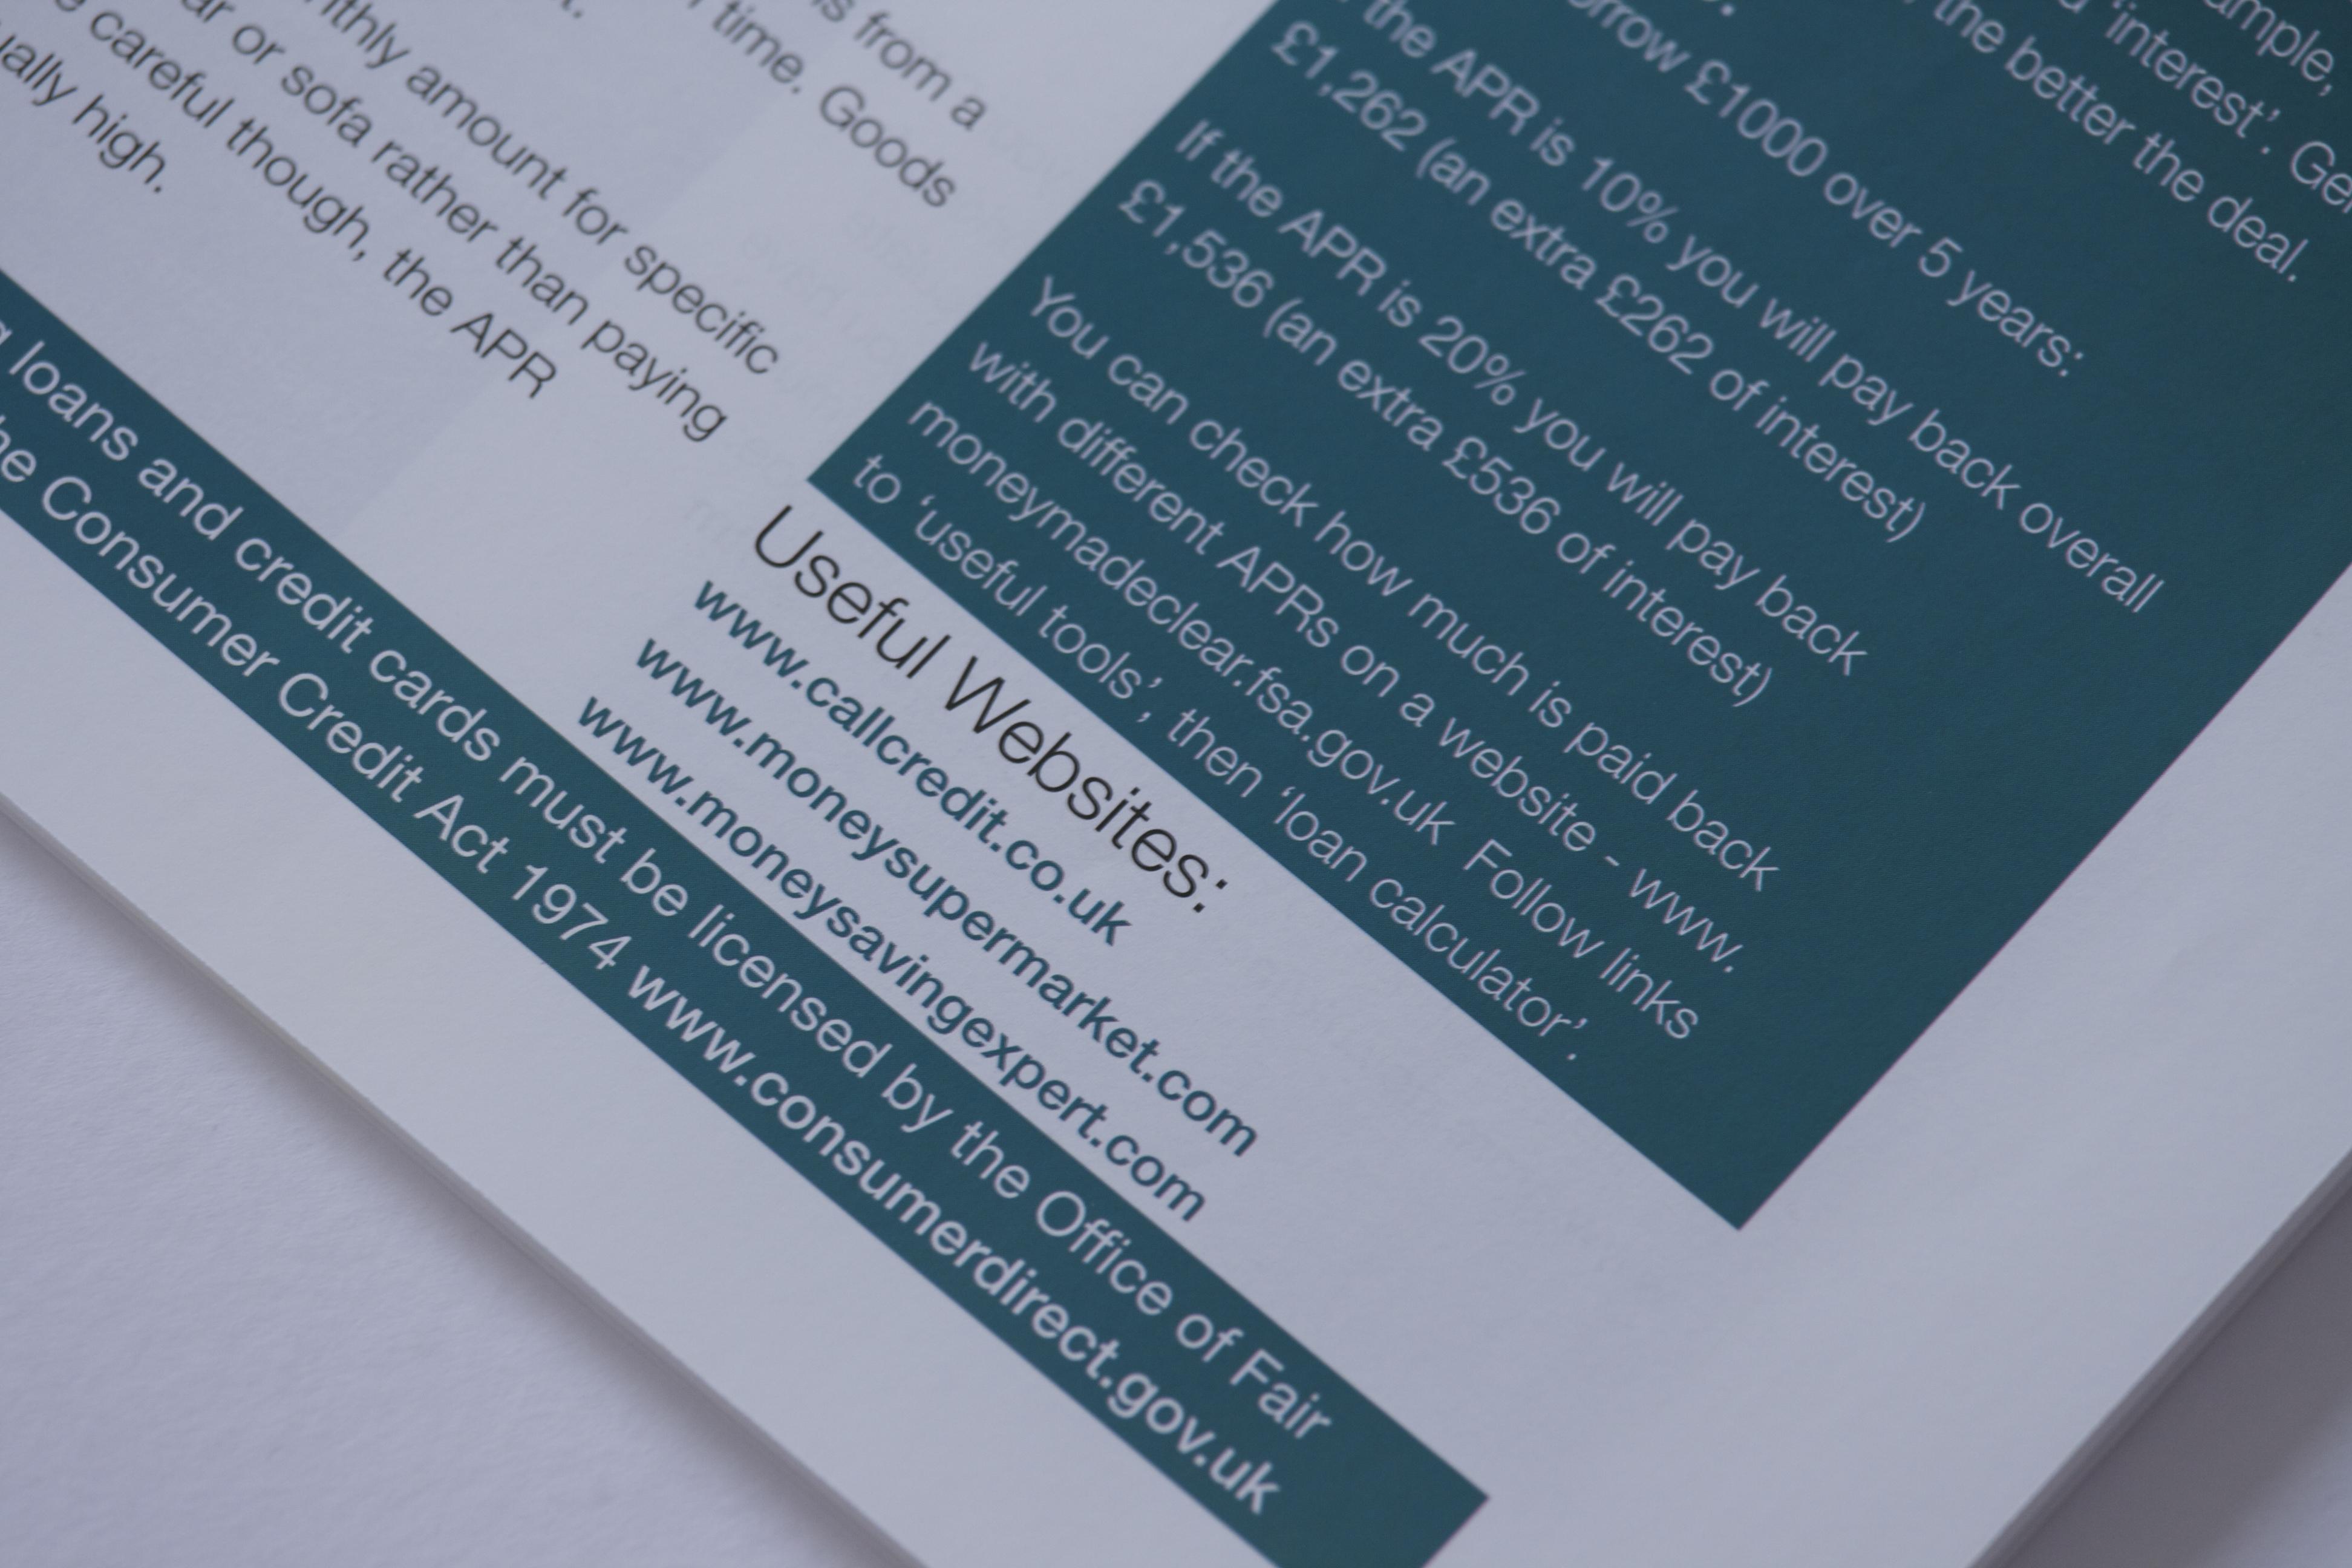 coloured header in rmarkdown pdf